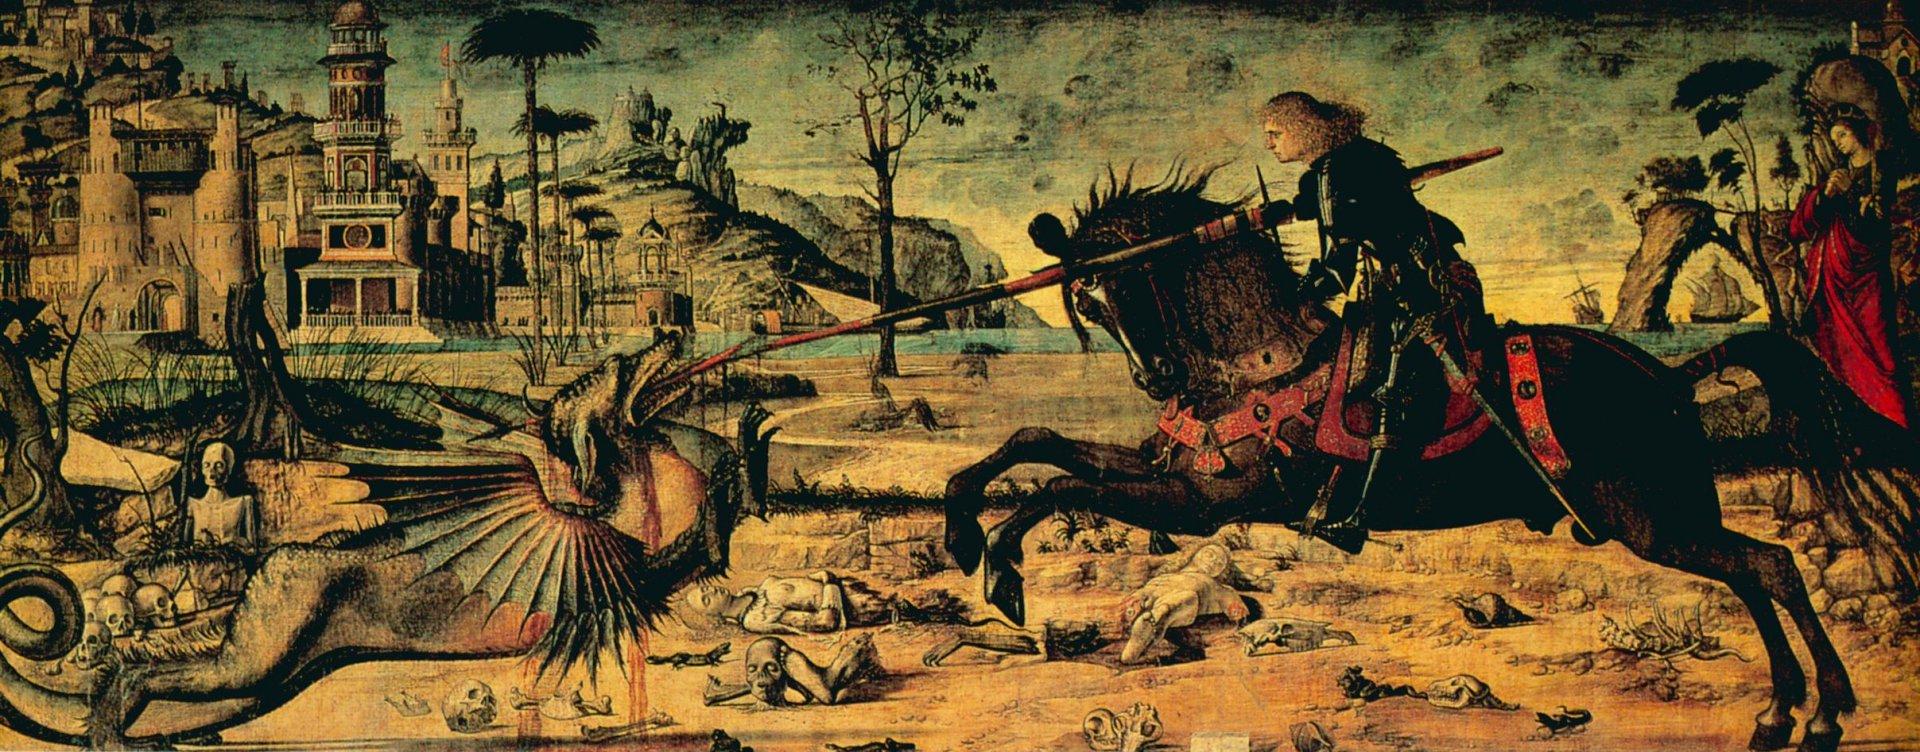 1310907185_1501-1507-carpaccio-vittore-st-georges-tuant-le-dragon_www.nevsepic.com.ua.jpg